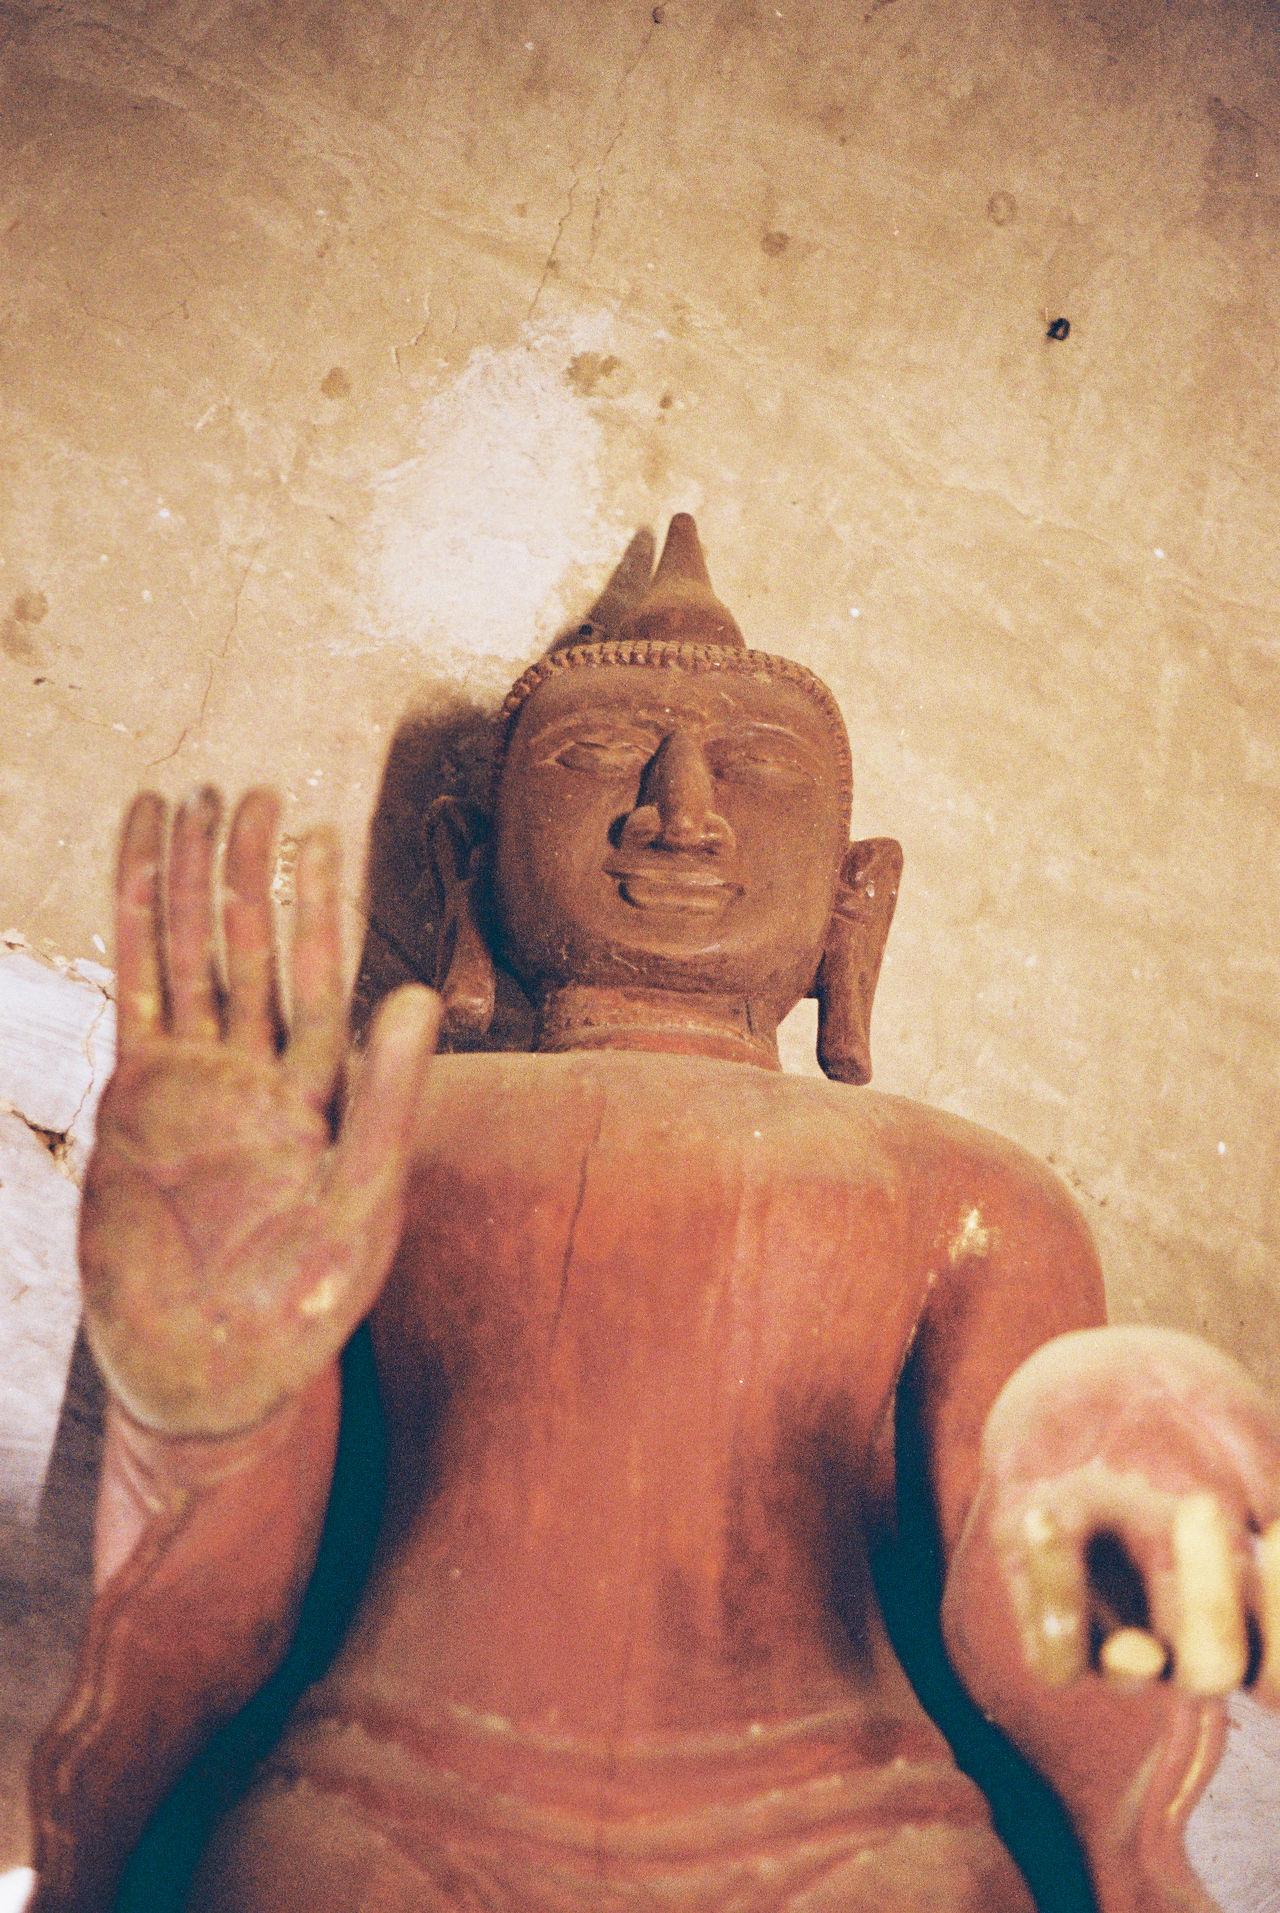 The Photojournalist - 2017 EyeEm Awards Iusefilm Ishootfilm 35mm Godak Gold 200 Bagan, Myanmar Bagan Myanmar Travel Destinations Spirituality Buddha Buddhism Arts Culture And Entertainment Ancient Civilization